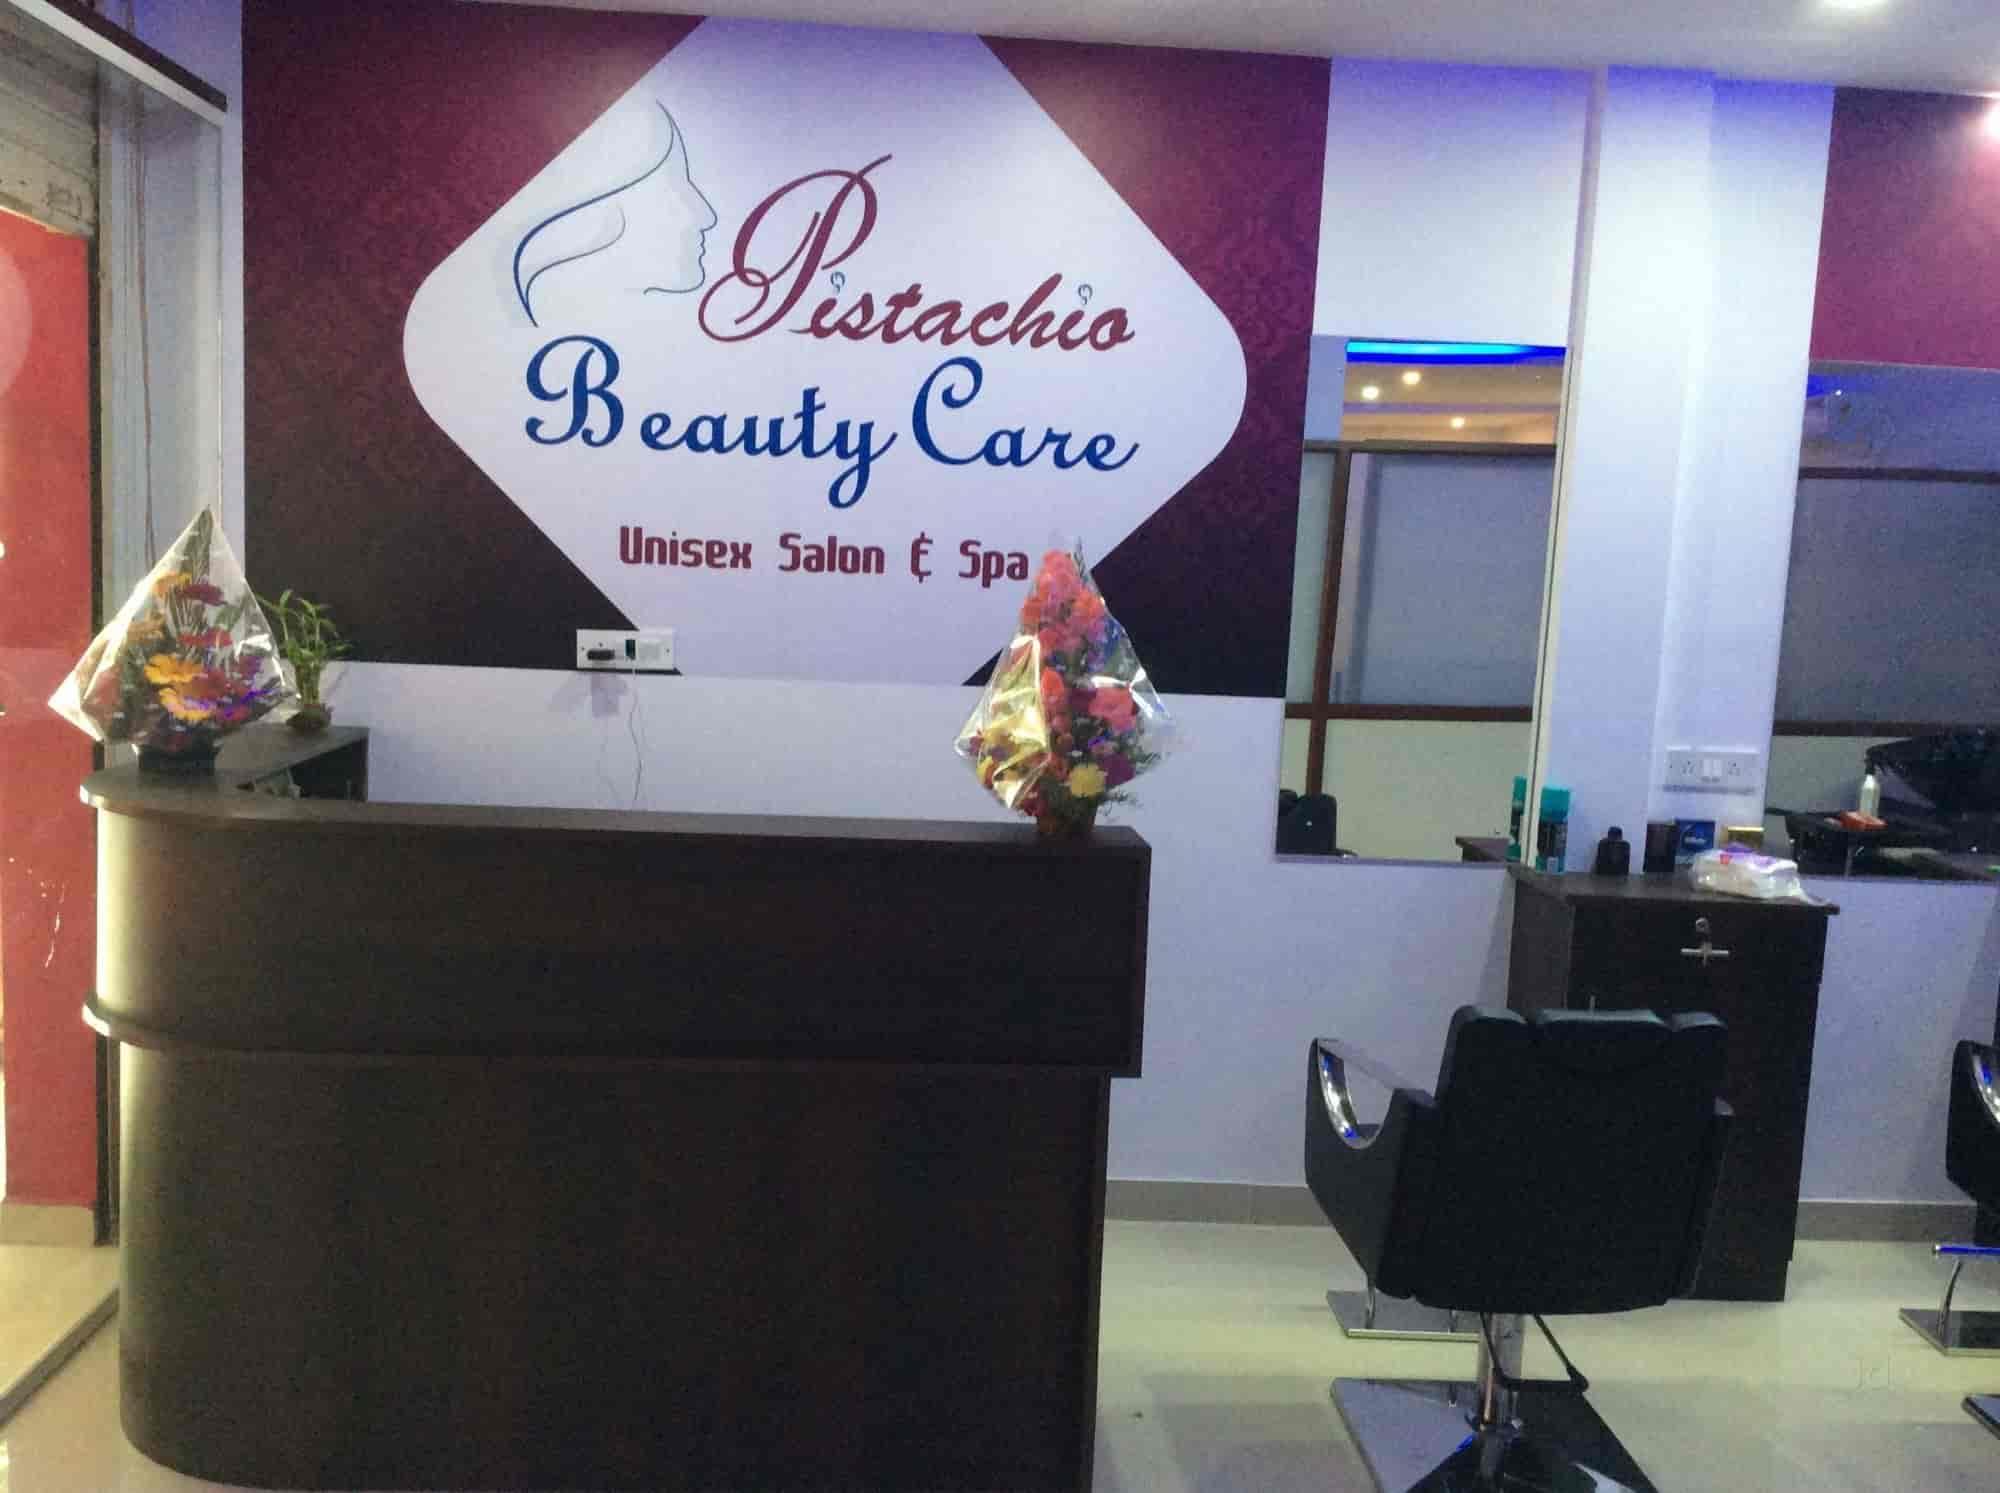 Pistachio Beauty Care Unisex Salon & Spa, Haralur-HSR Layout - Body